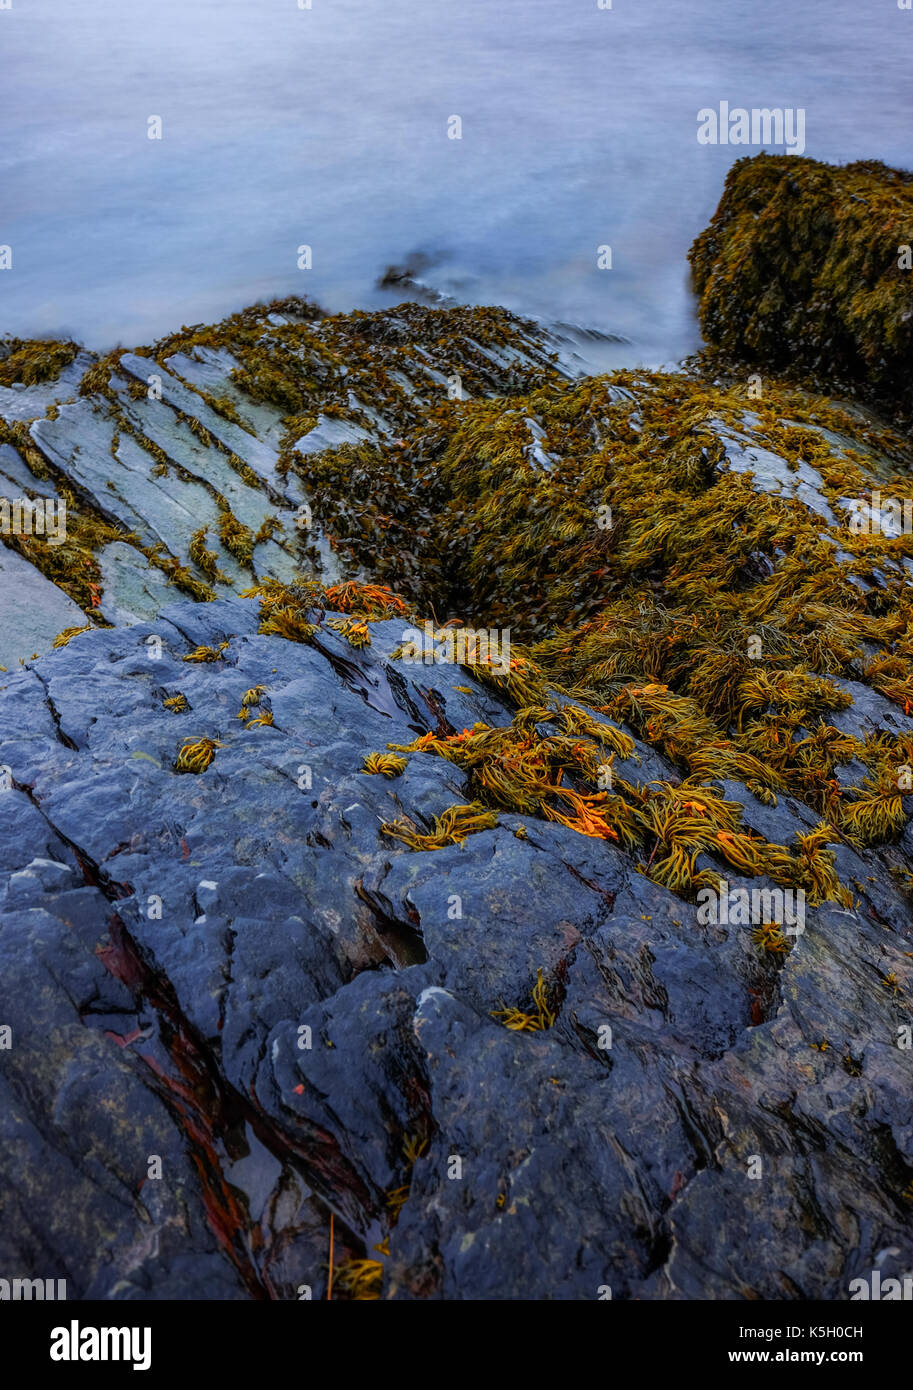 Portmeirion coast with longtime exposure - Stock Image